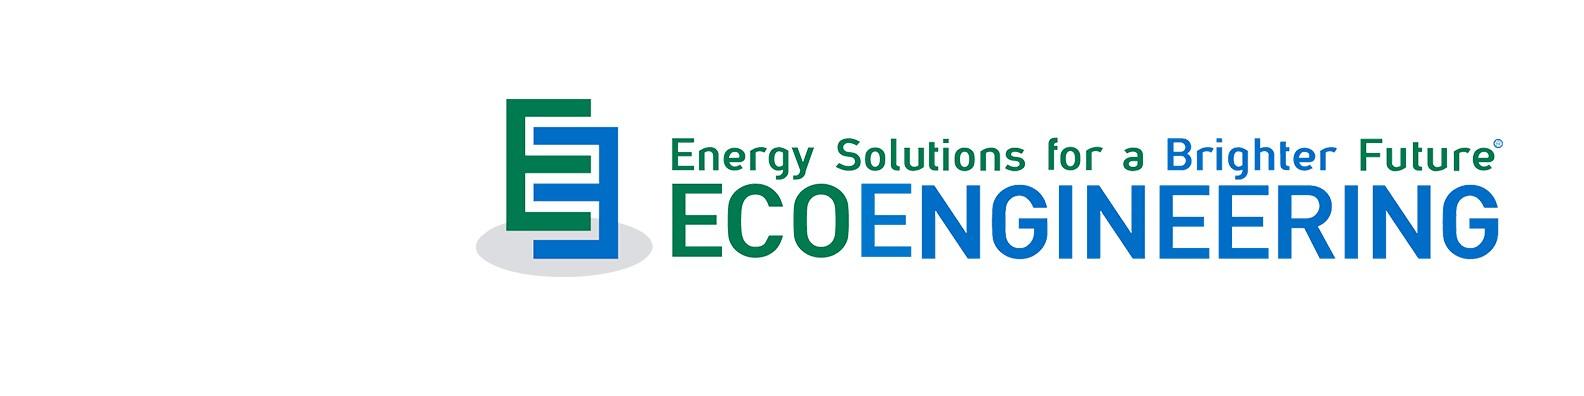 Eco Engineering Inc Linkedin